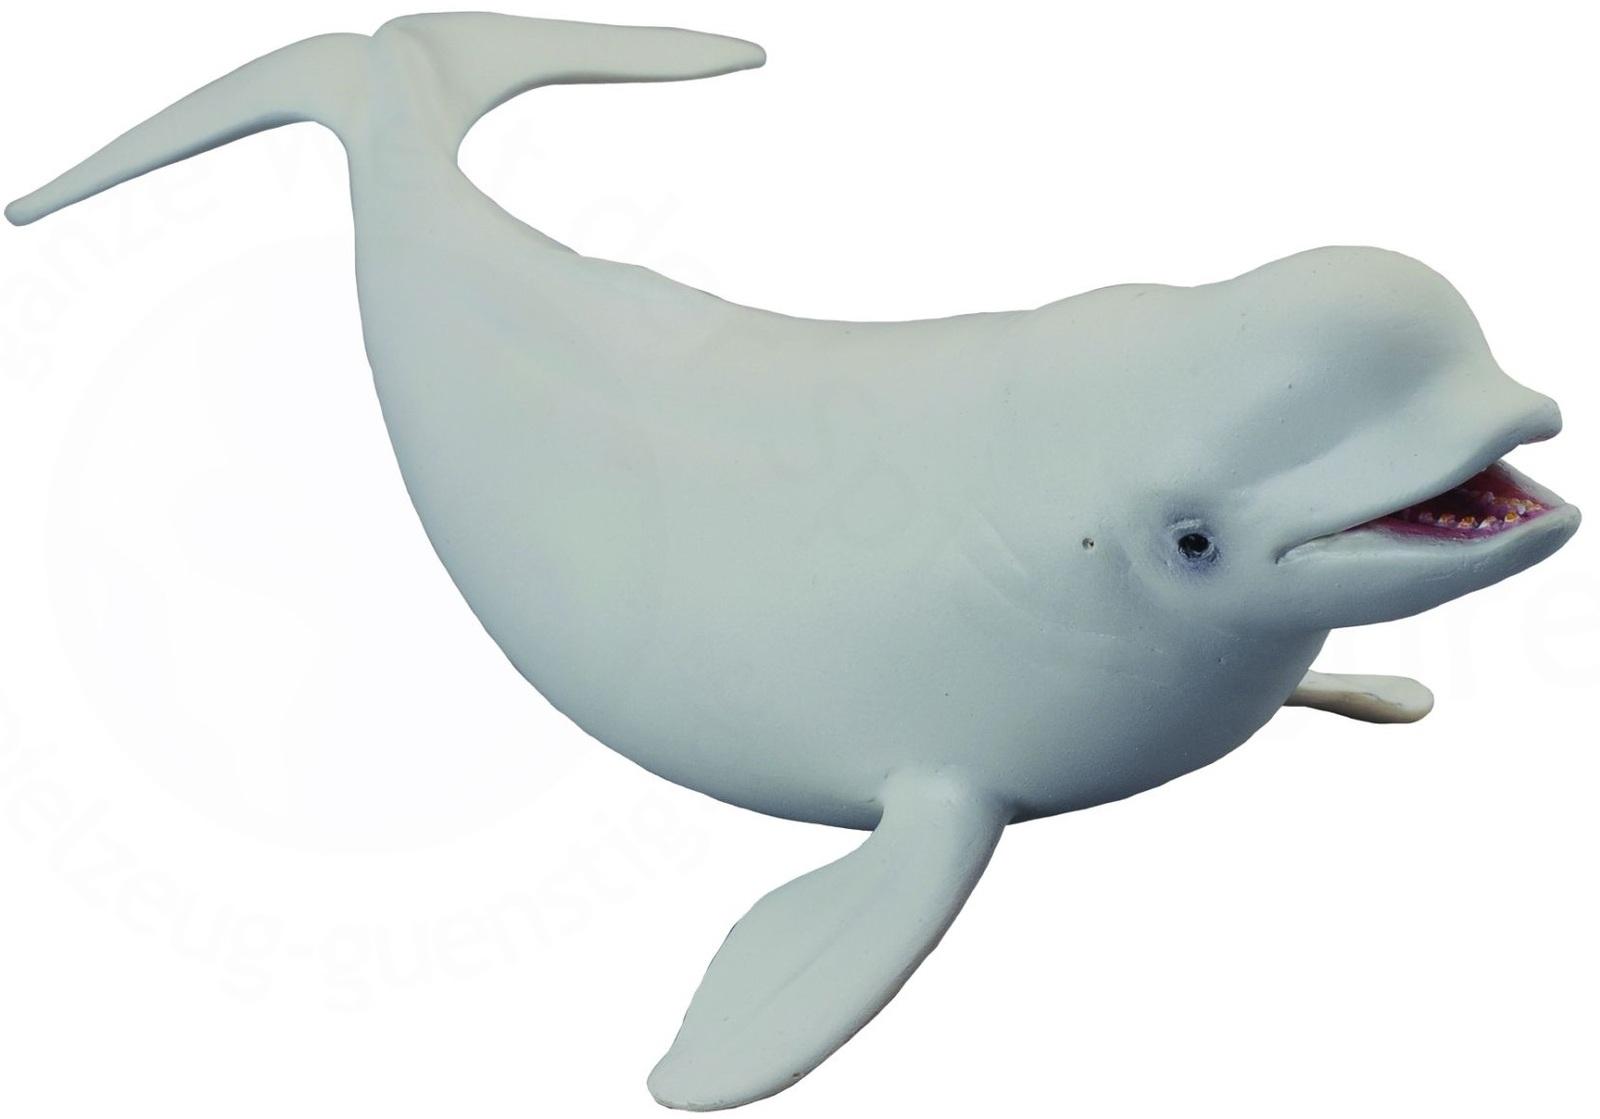 Beluga Whale clipart #8, Download drawings